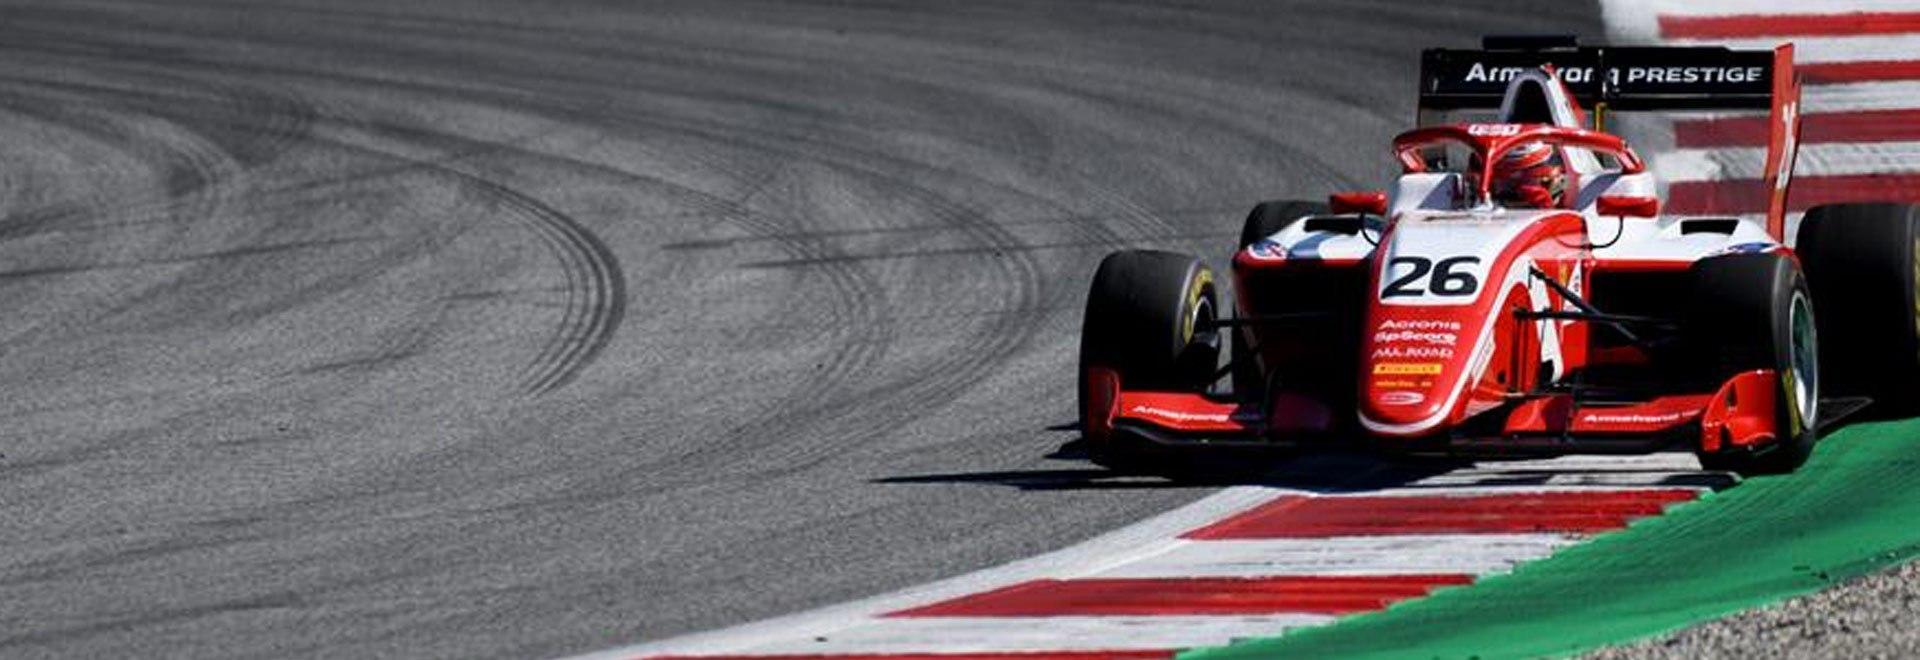 GP Toscana. Gara 1